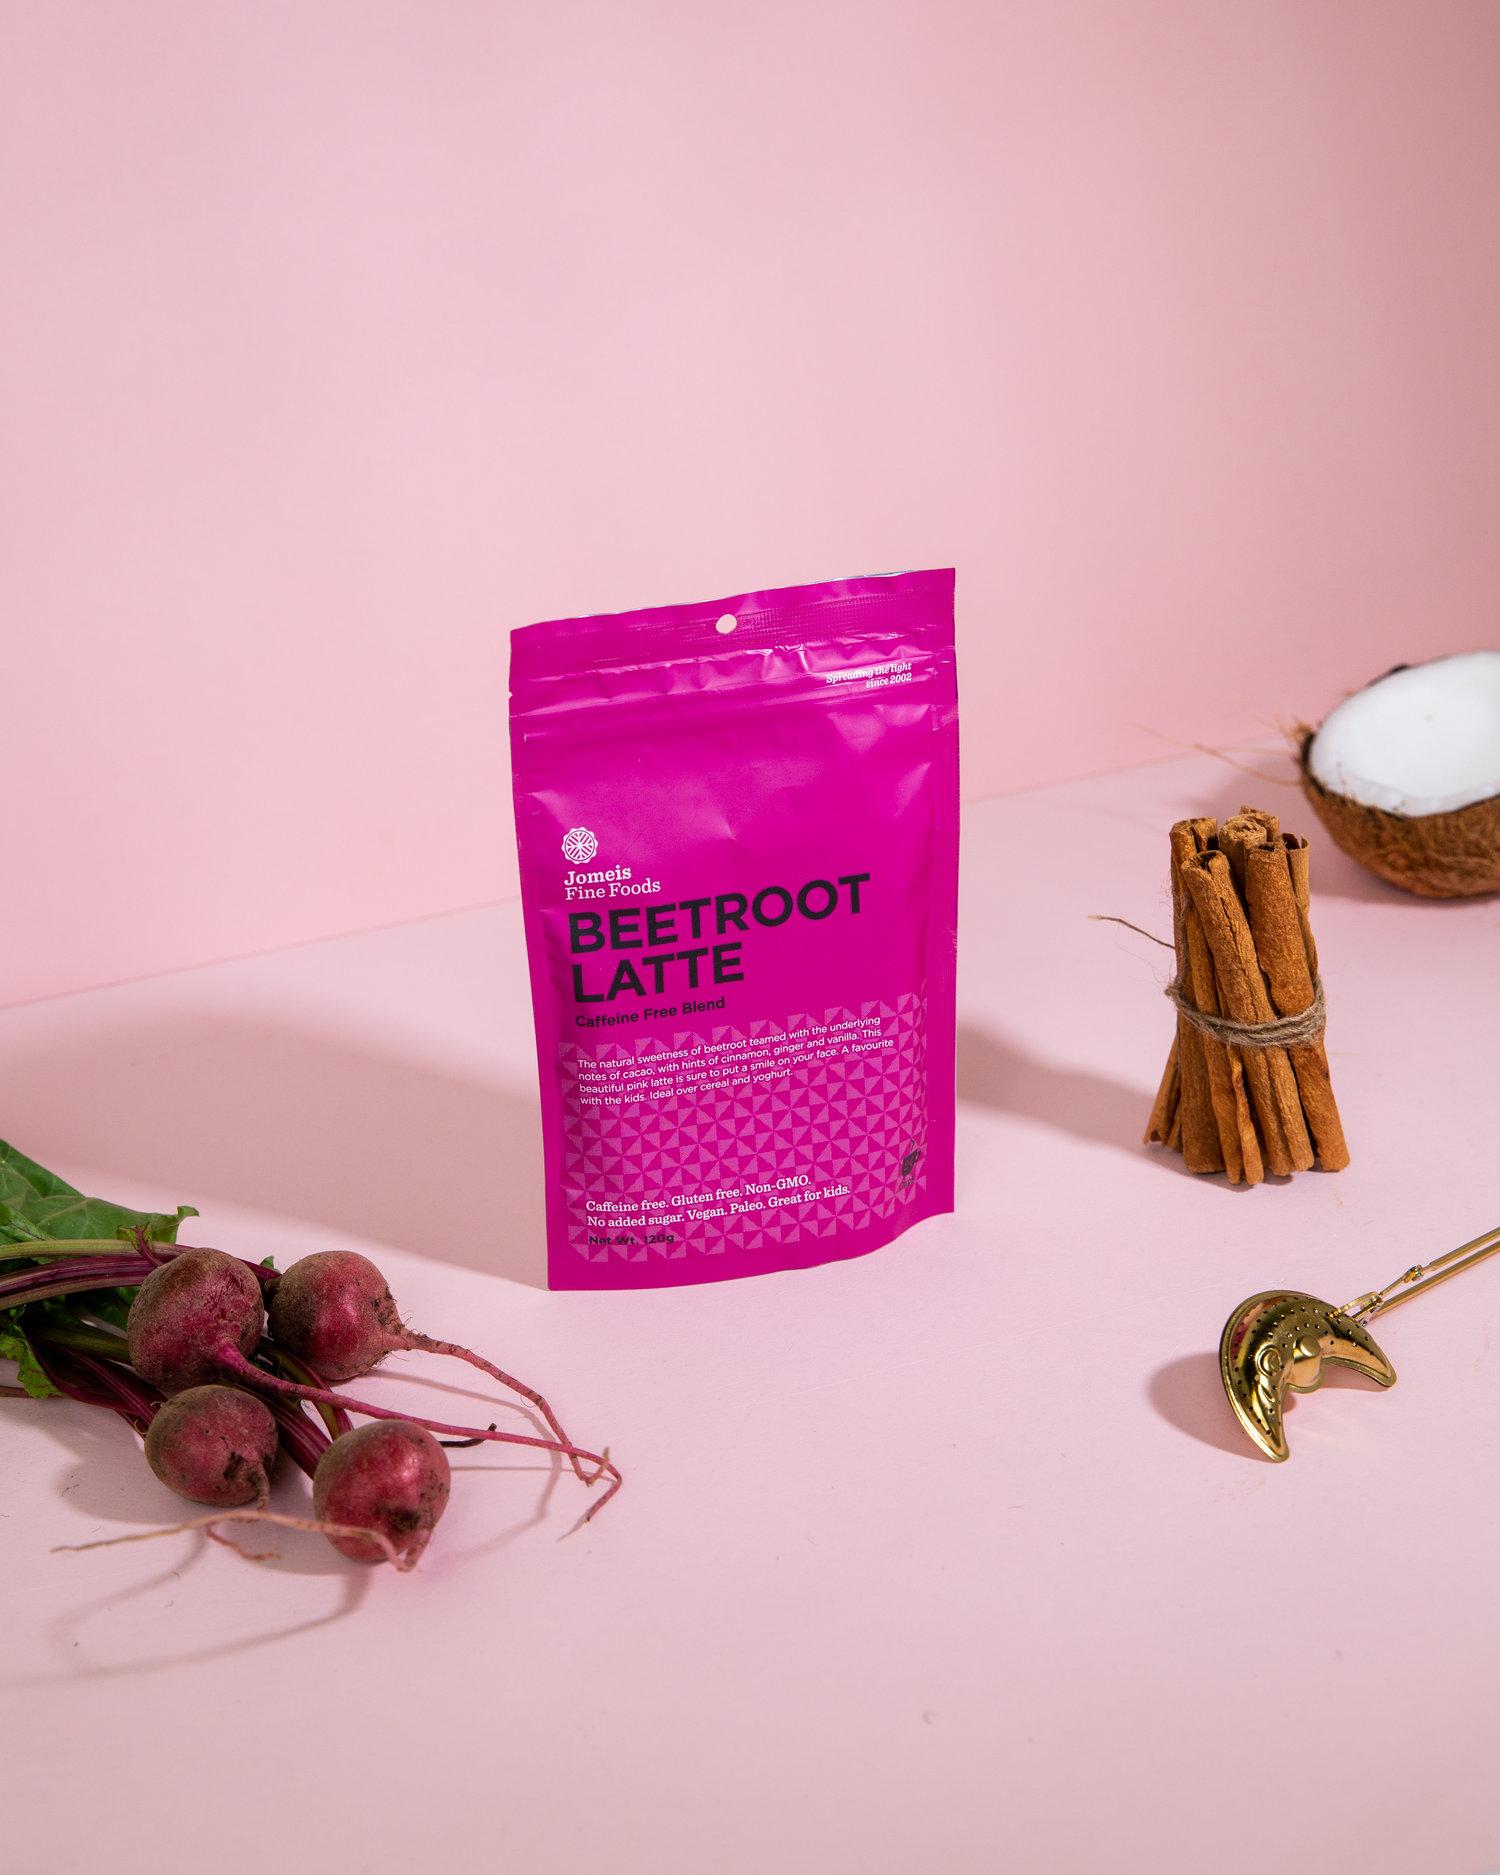 Jomeis - Beetroot Latte